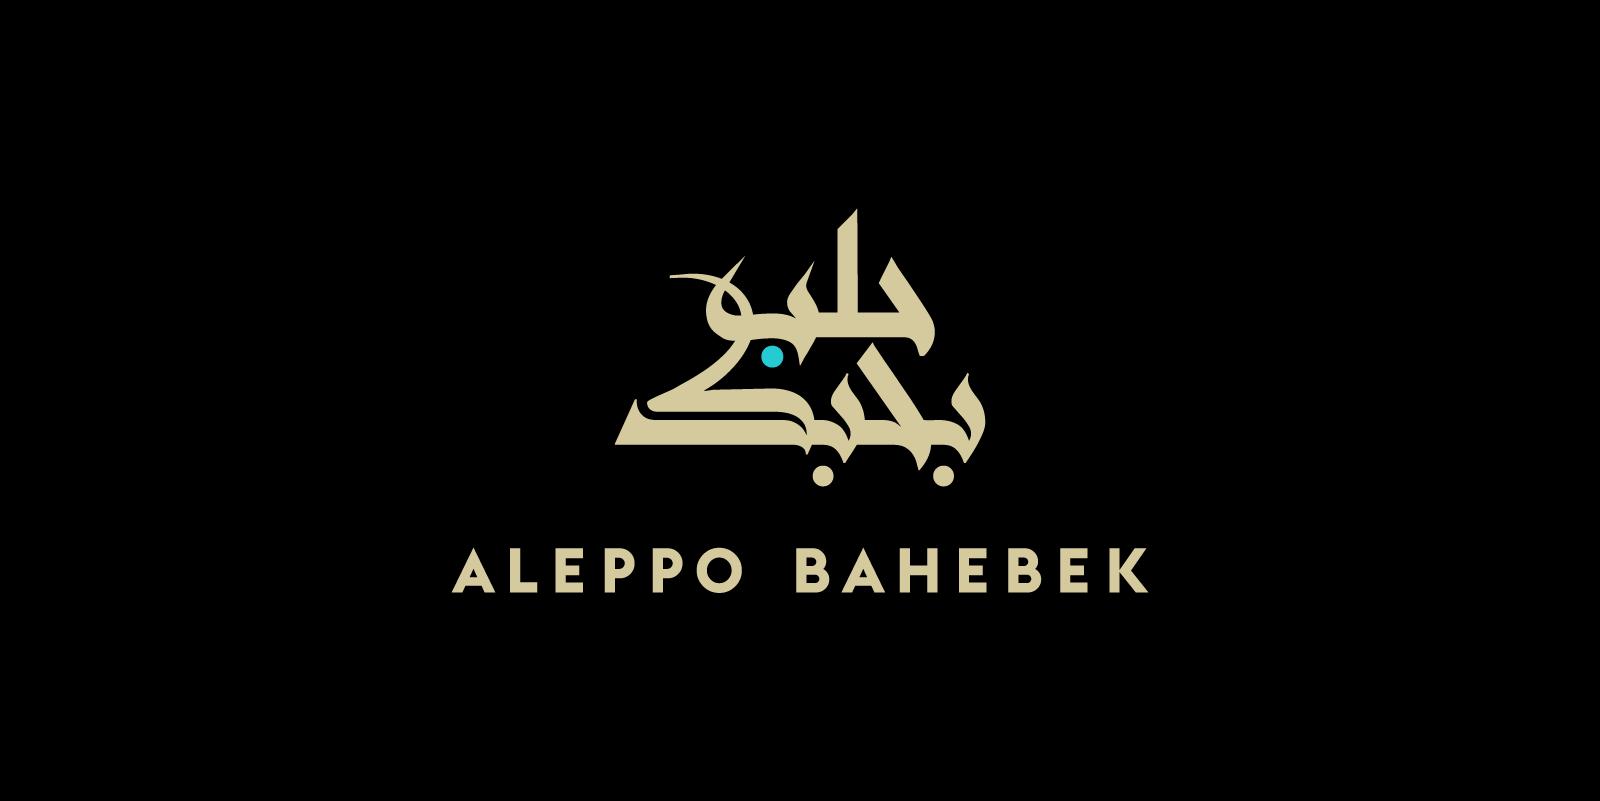 Aleppo Bahebek – logo